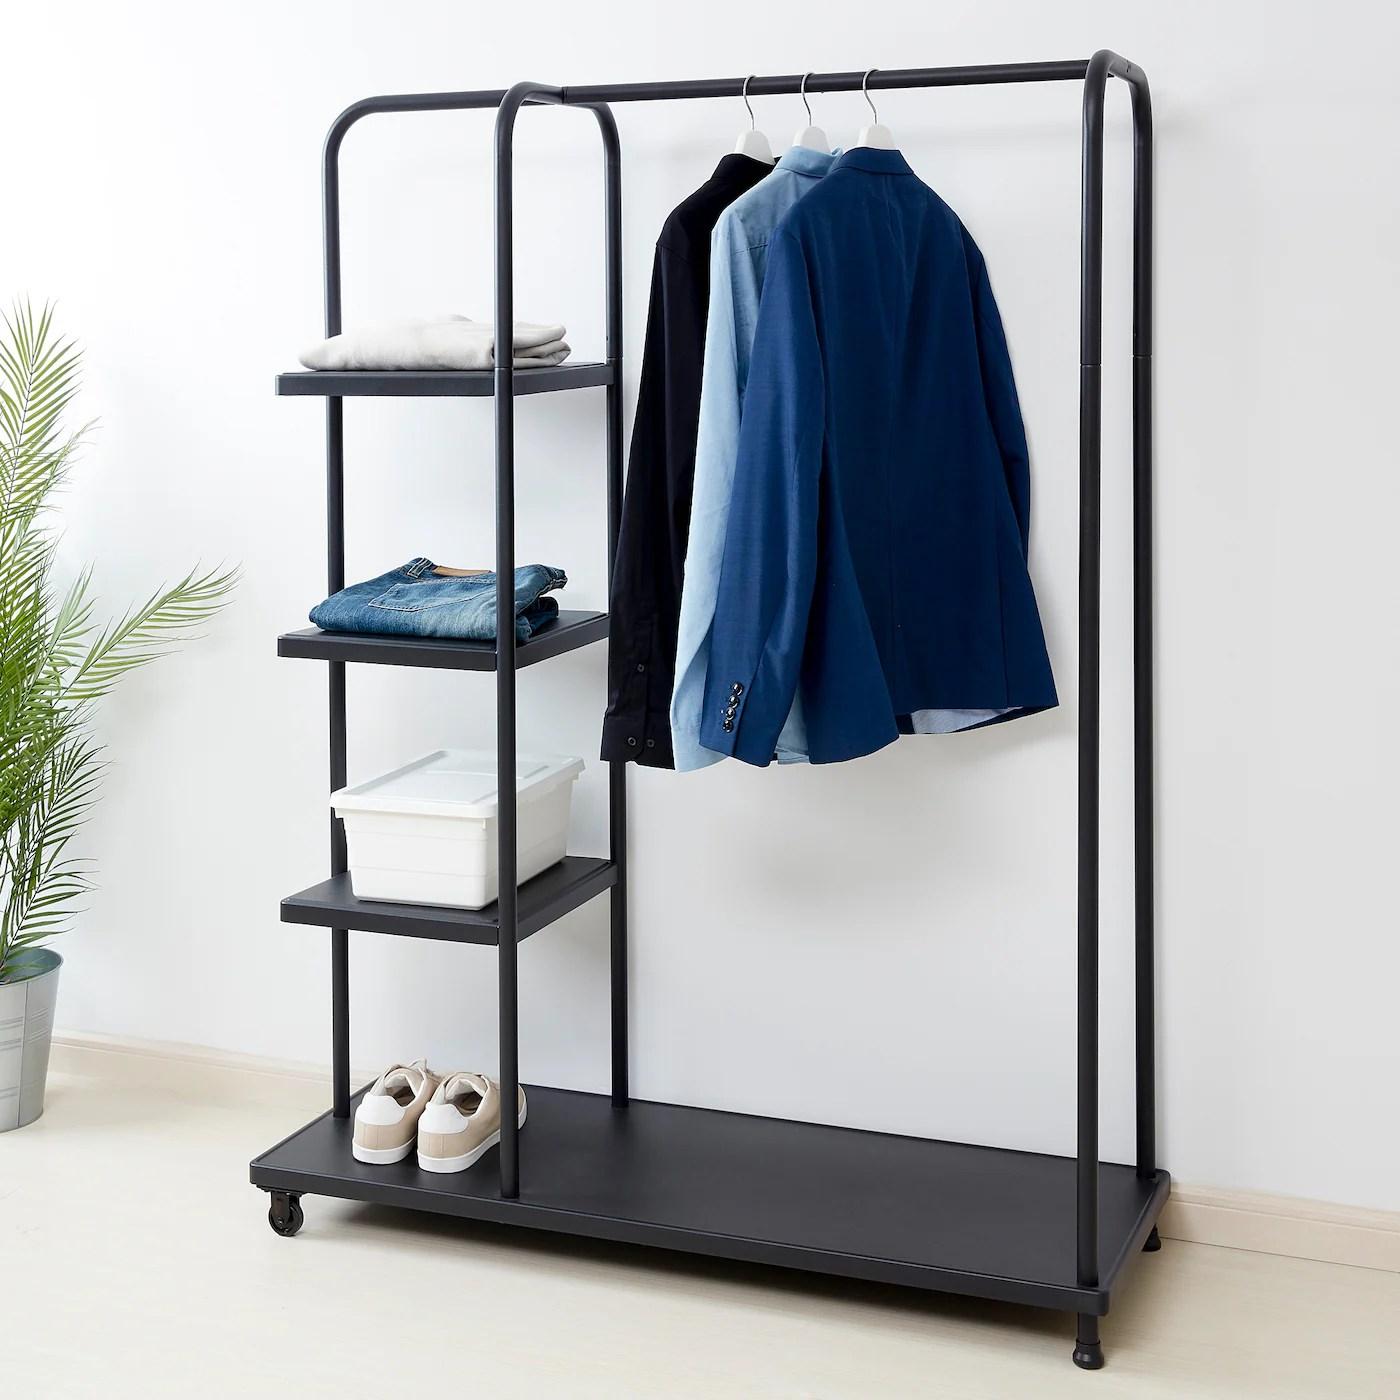 kornsjo clothes rack black 47 1 4x17 3 4x63